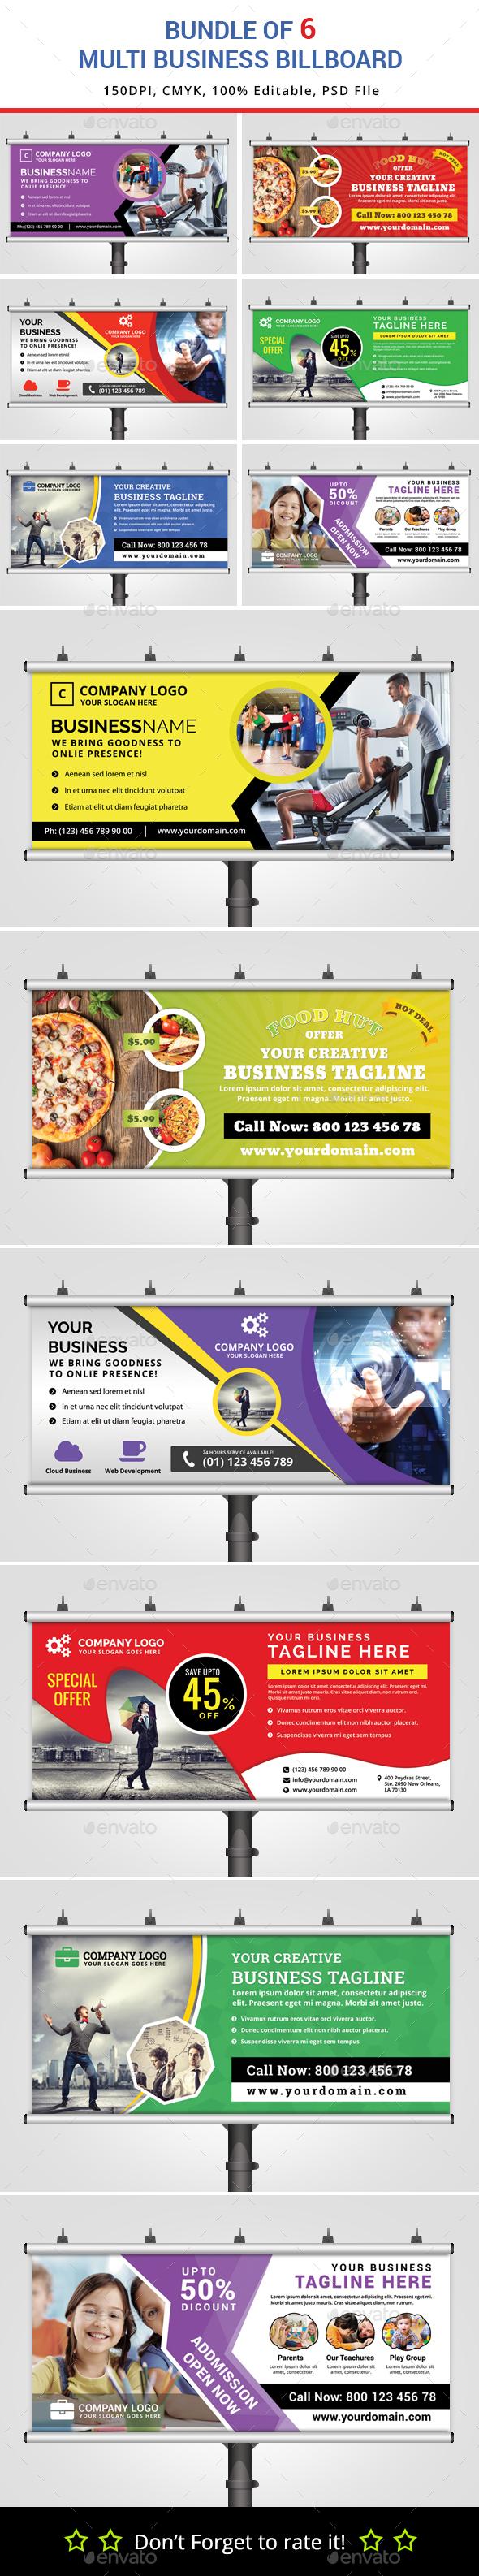 Bundle of 6 Multipurpose Billboard Banners - Signage Print Templates